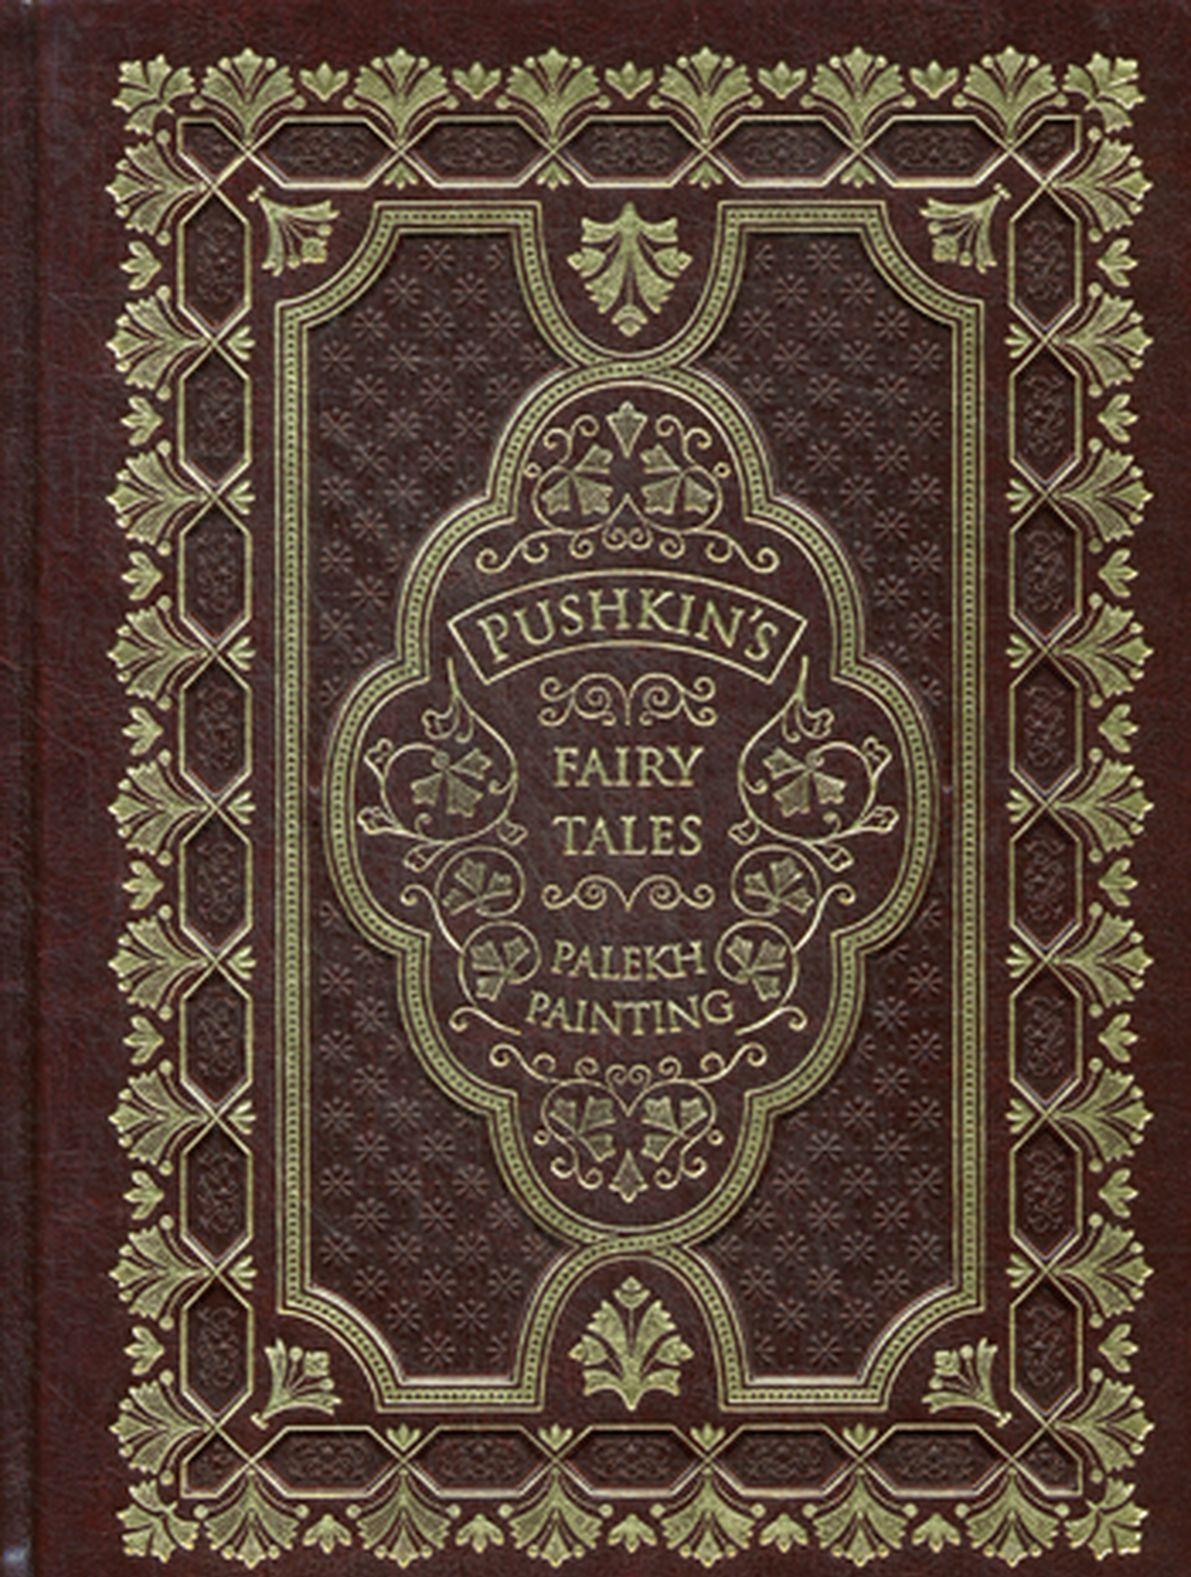 Pushkin's Fairy Tales: Palekh Painting (ekskljuzivnoe podarochnoe izdanie)